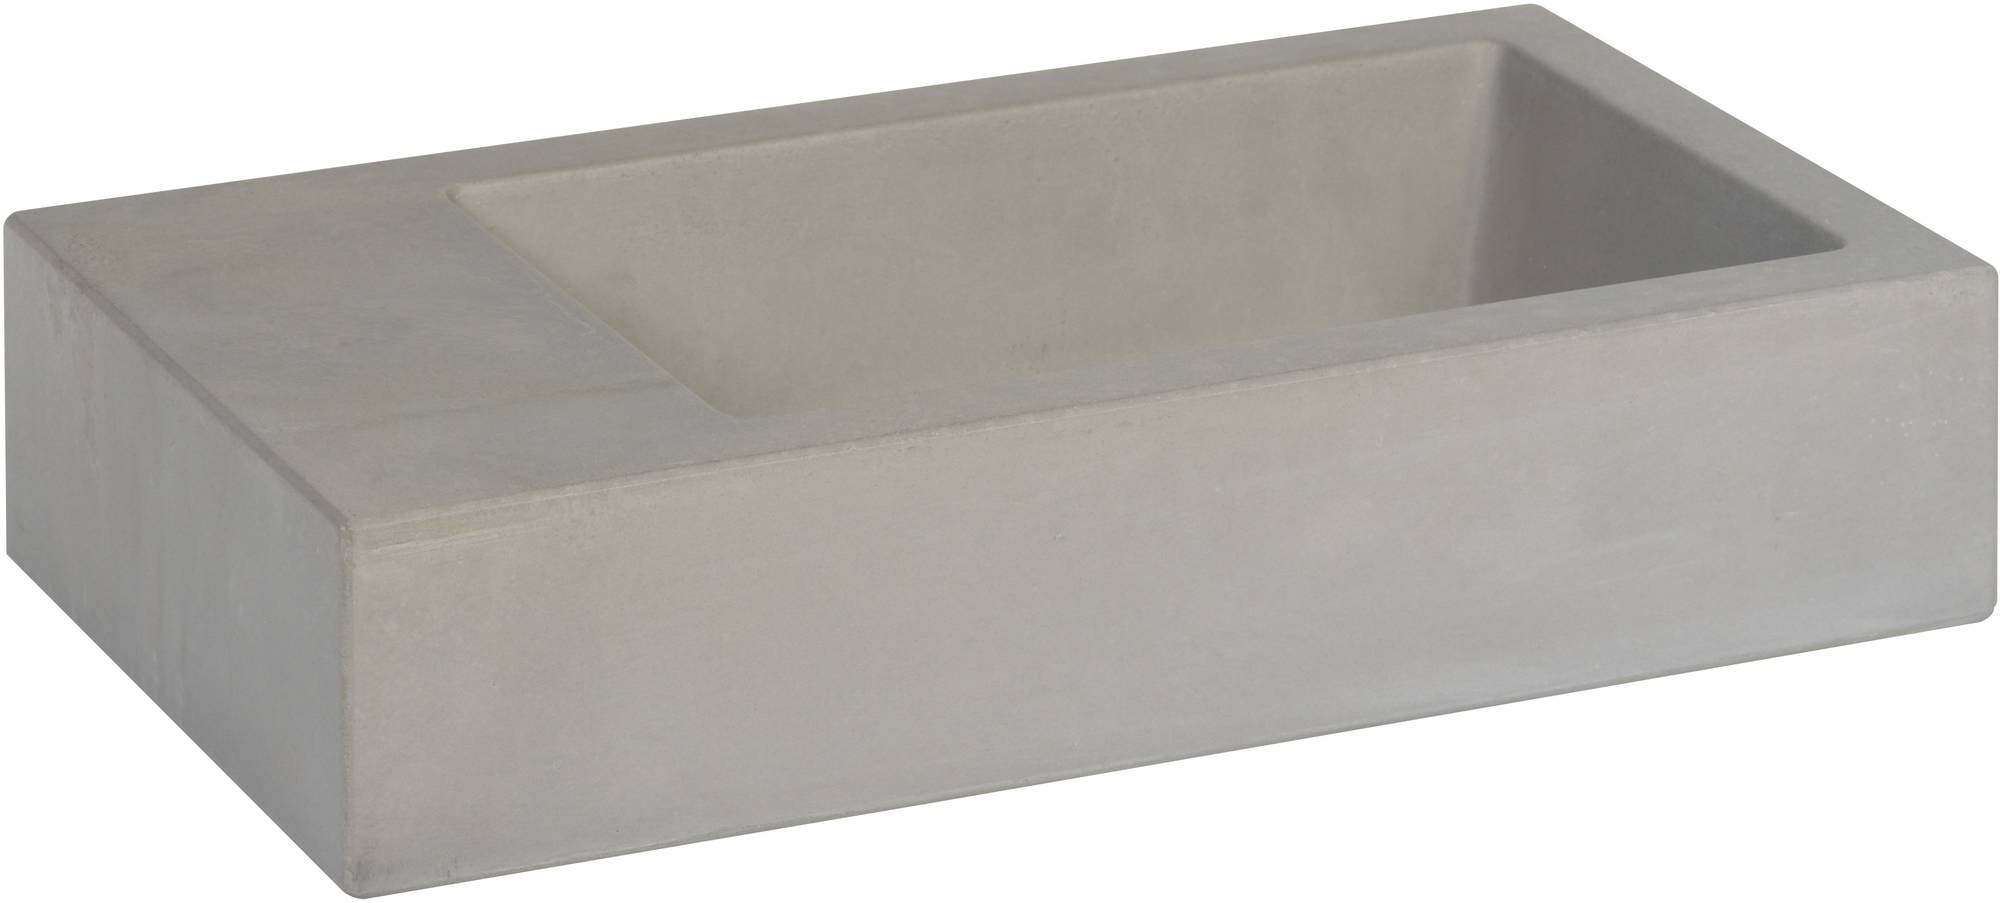 Ben Titan Fontein L 40x22,5x9,4 cm zonder Kraangat Beton